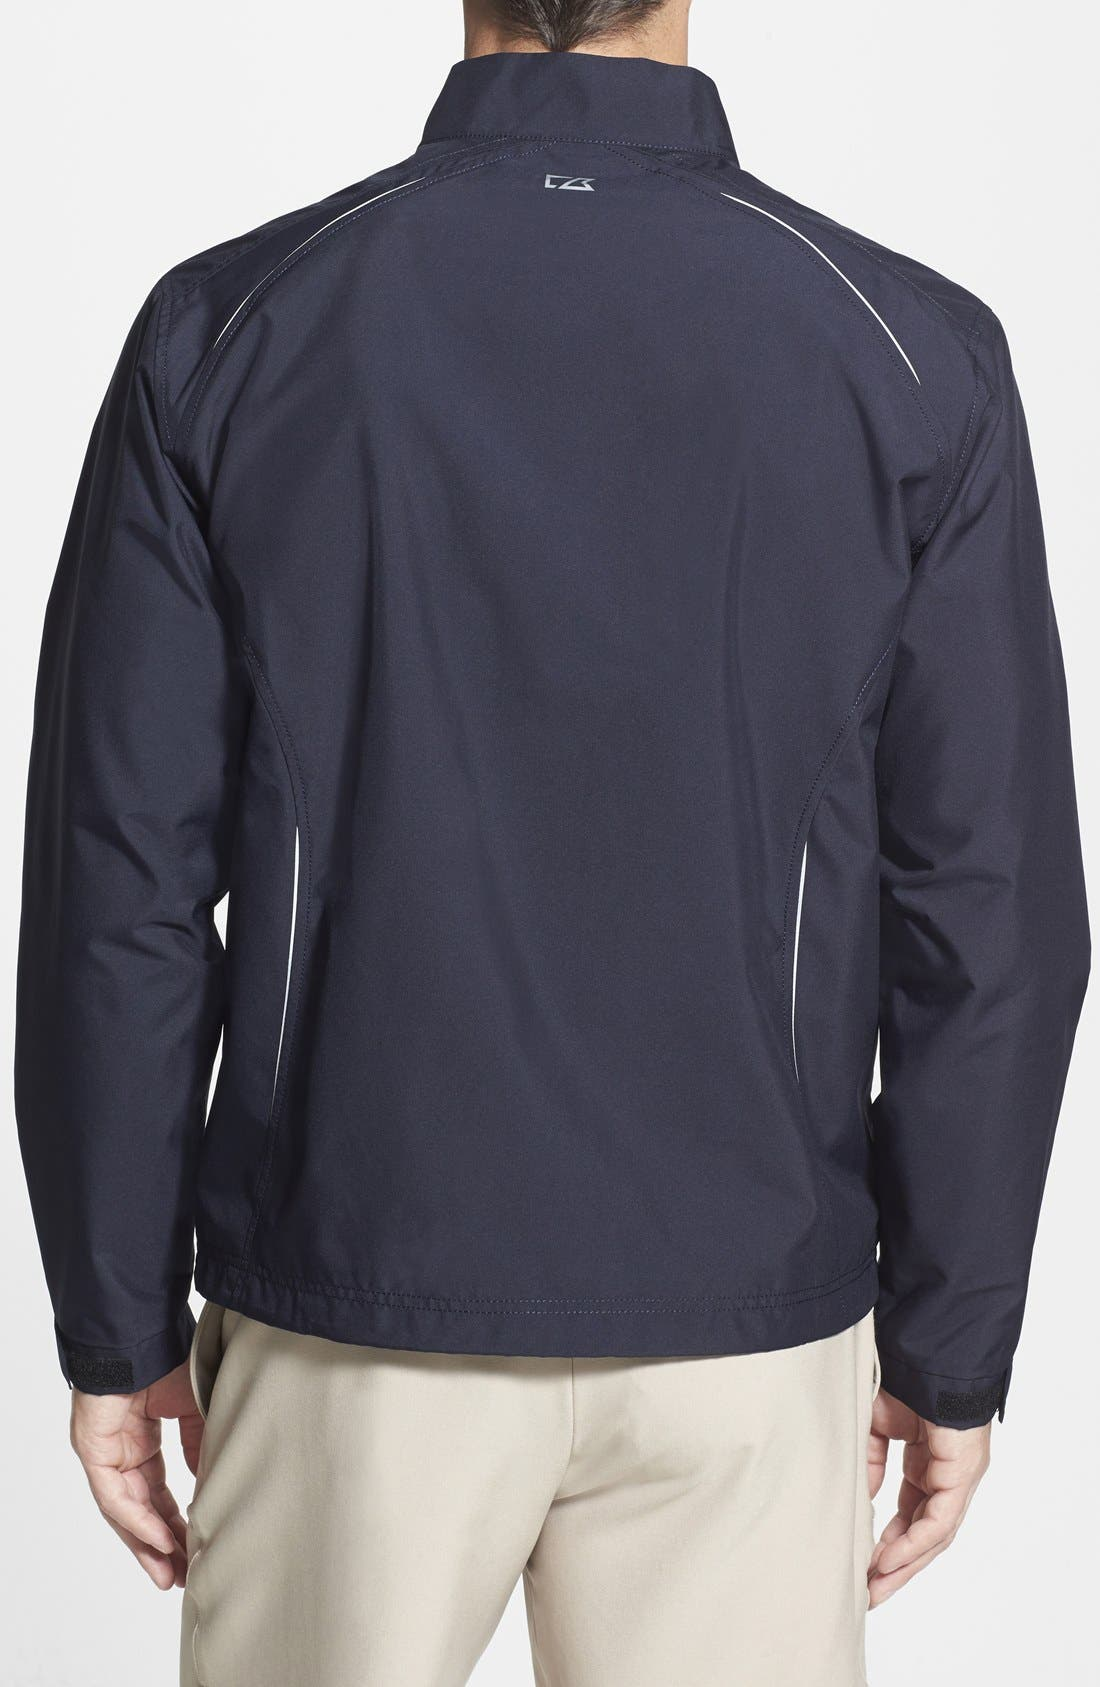 Seattle Seahawks - Beacon WeatherTec Wind & Water Resistant Jacket,                             Alternate thumbnail 2, color,                             420